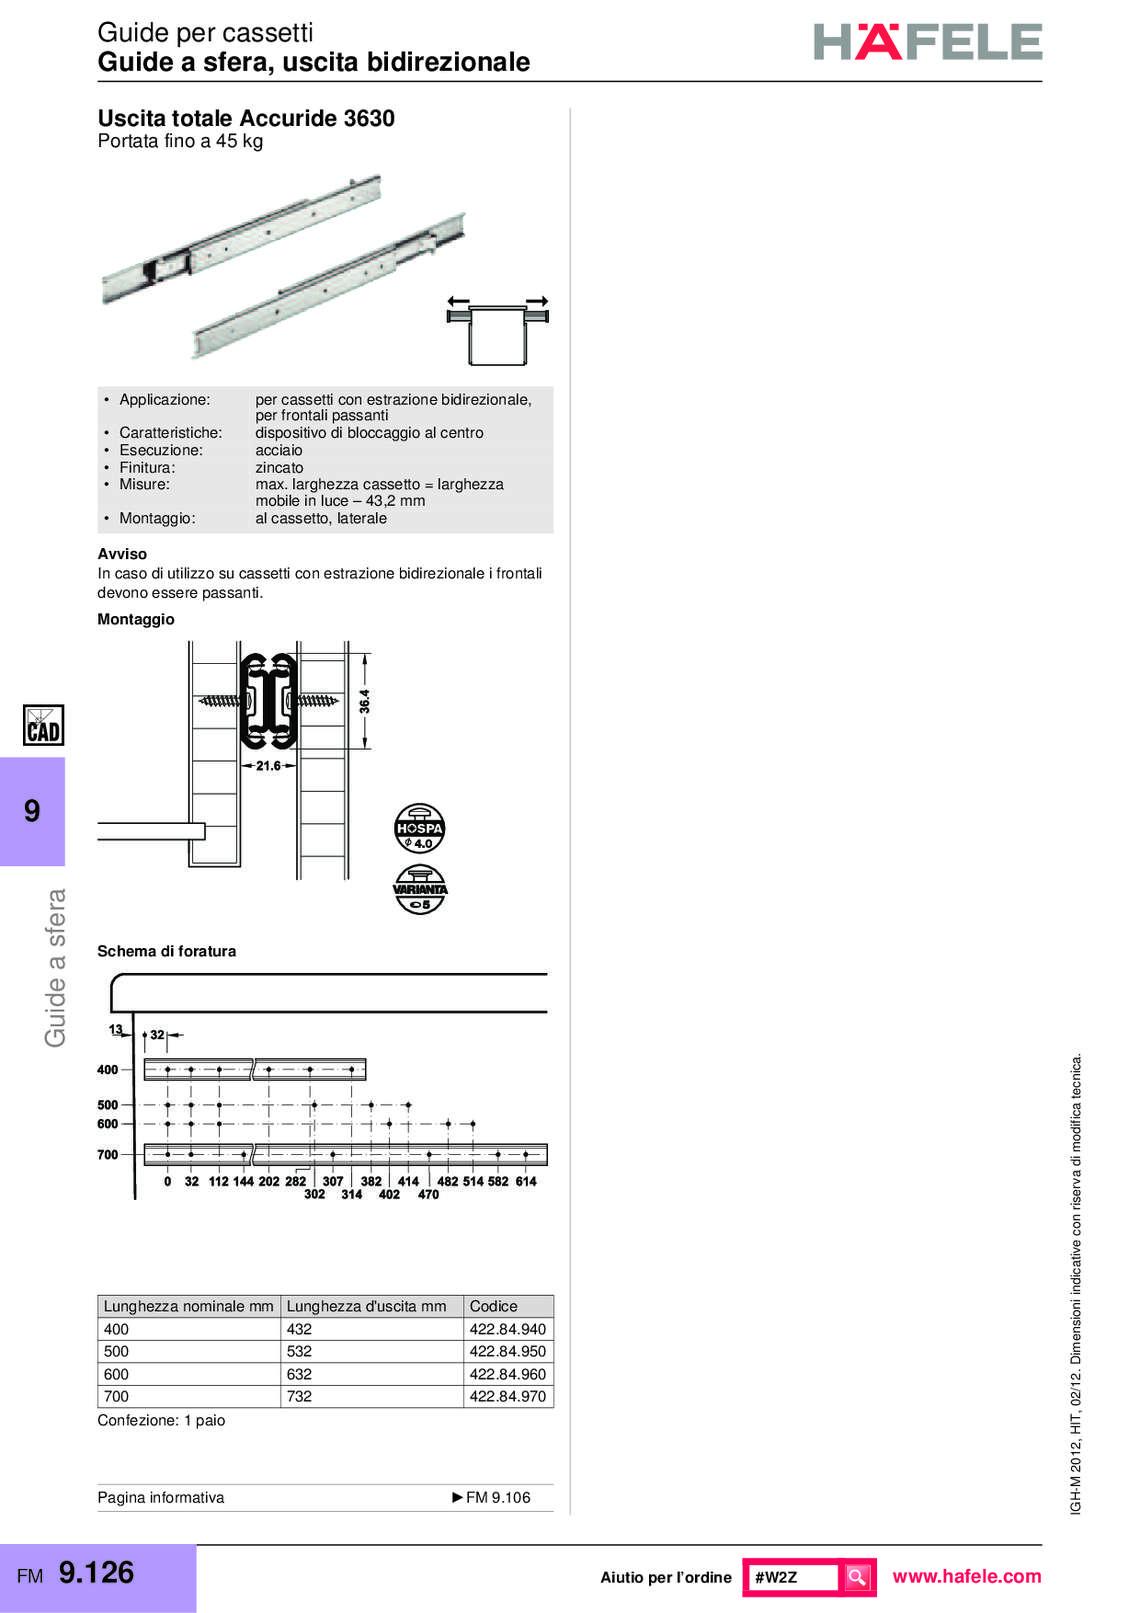 hafele-spondine-e-guide-per-mobili_40_179.jpg